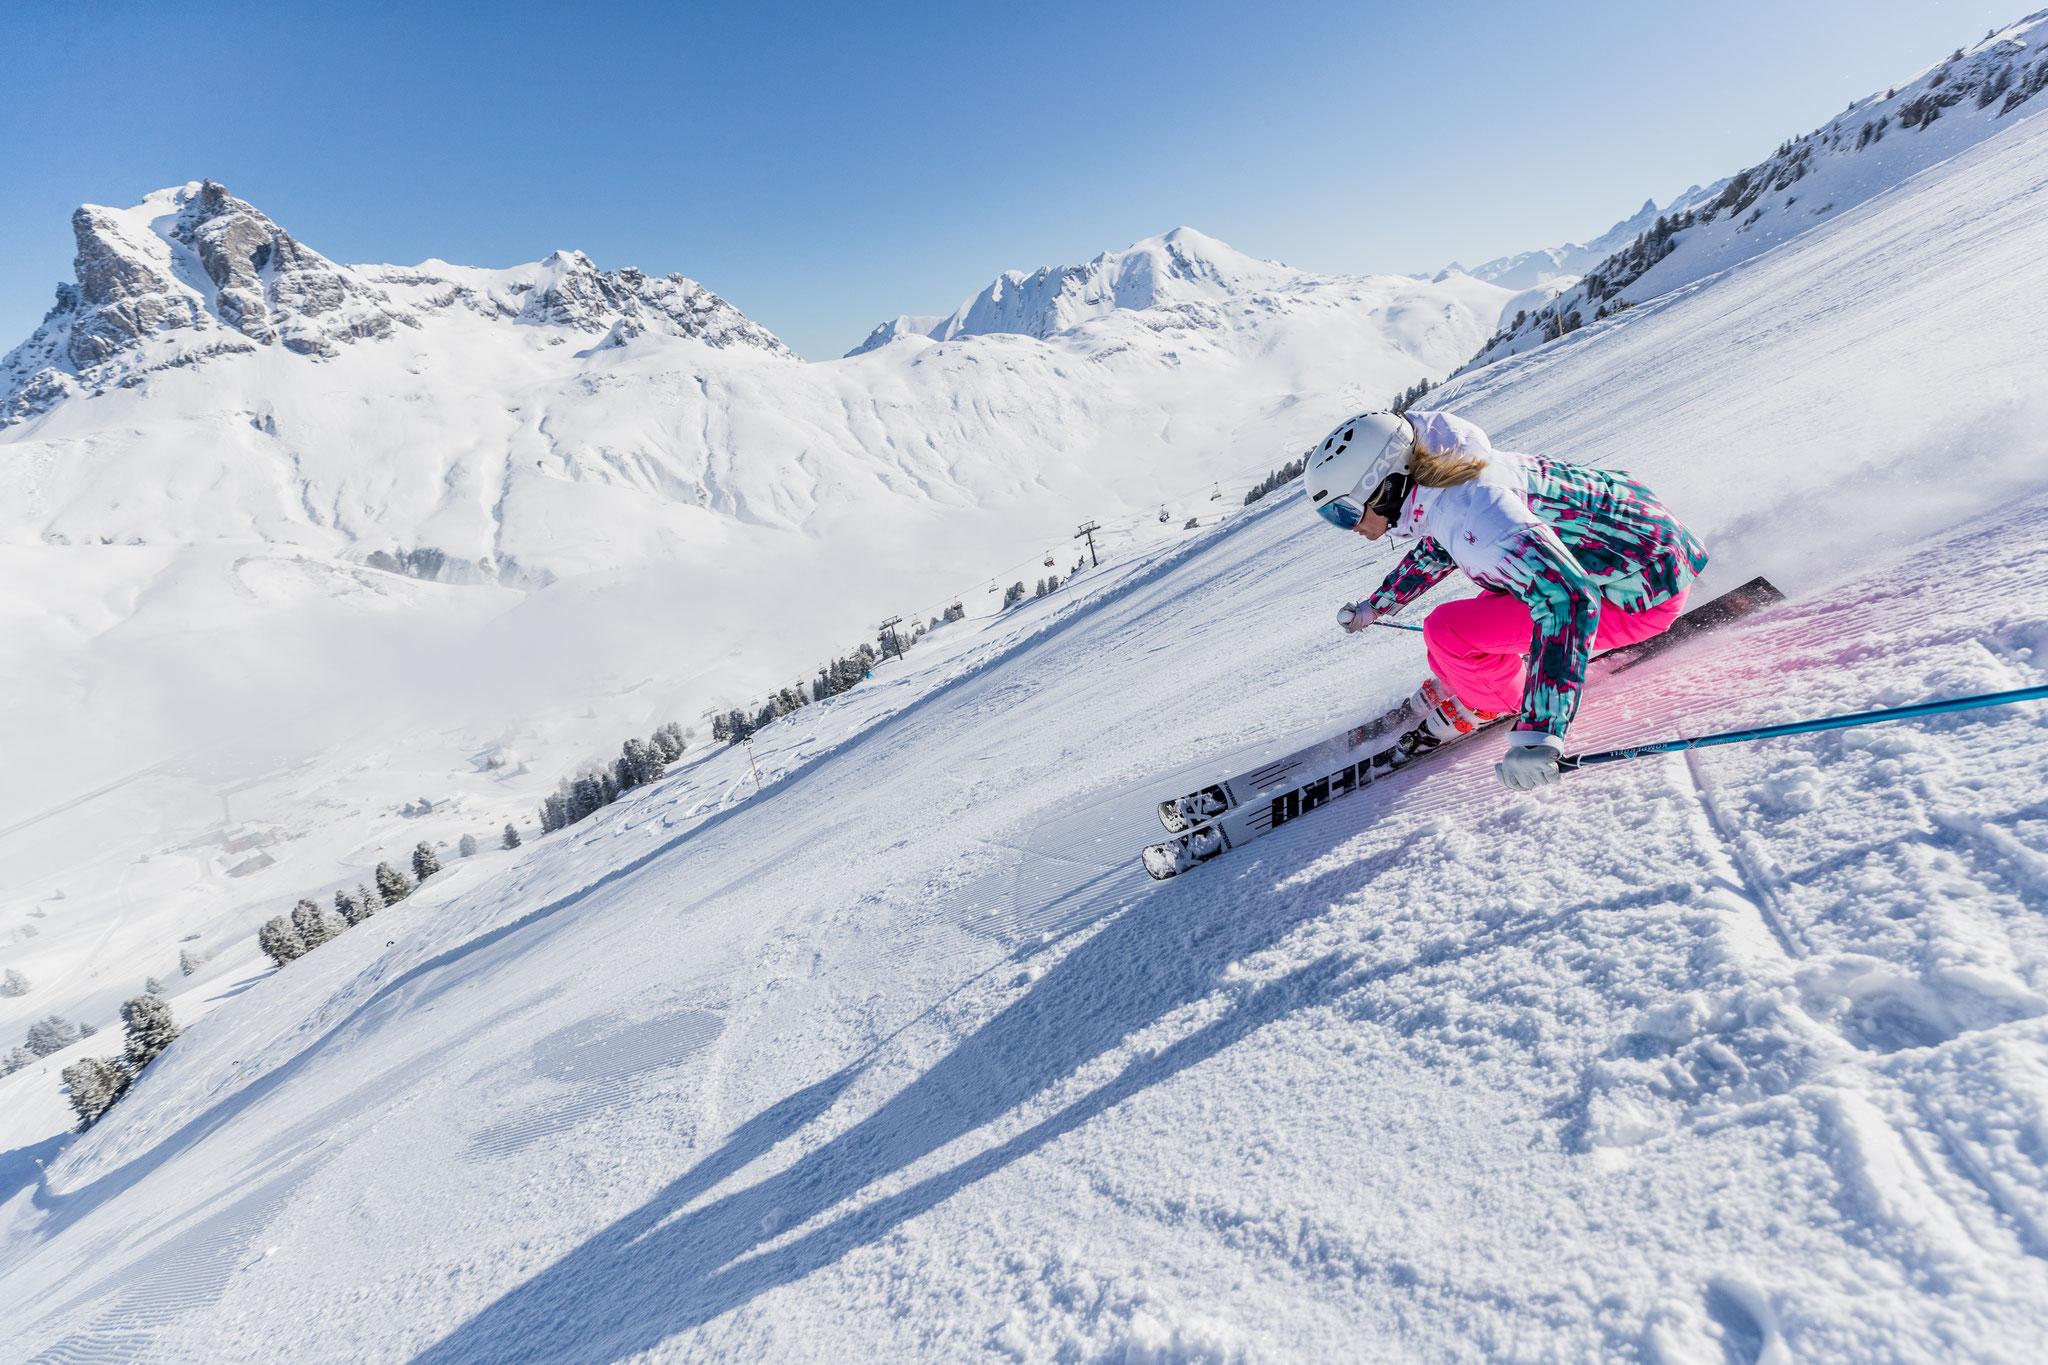 Arlberg: Paradies für Freerider